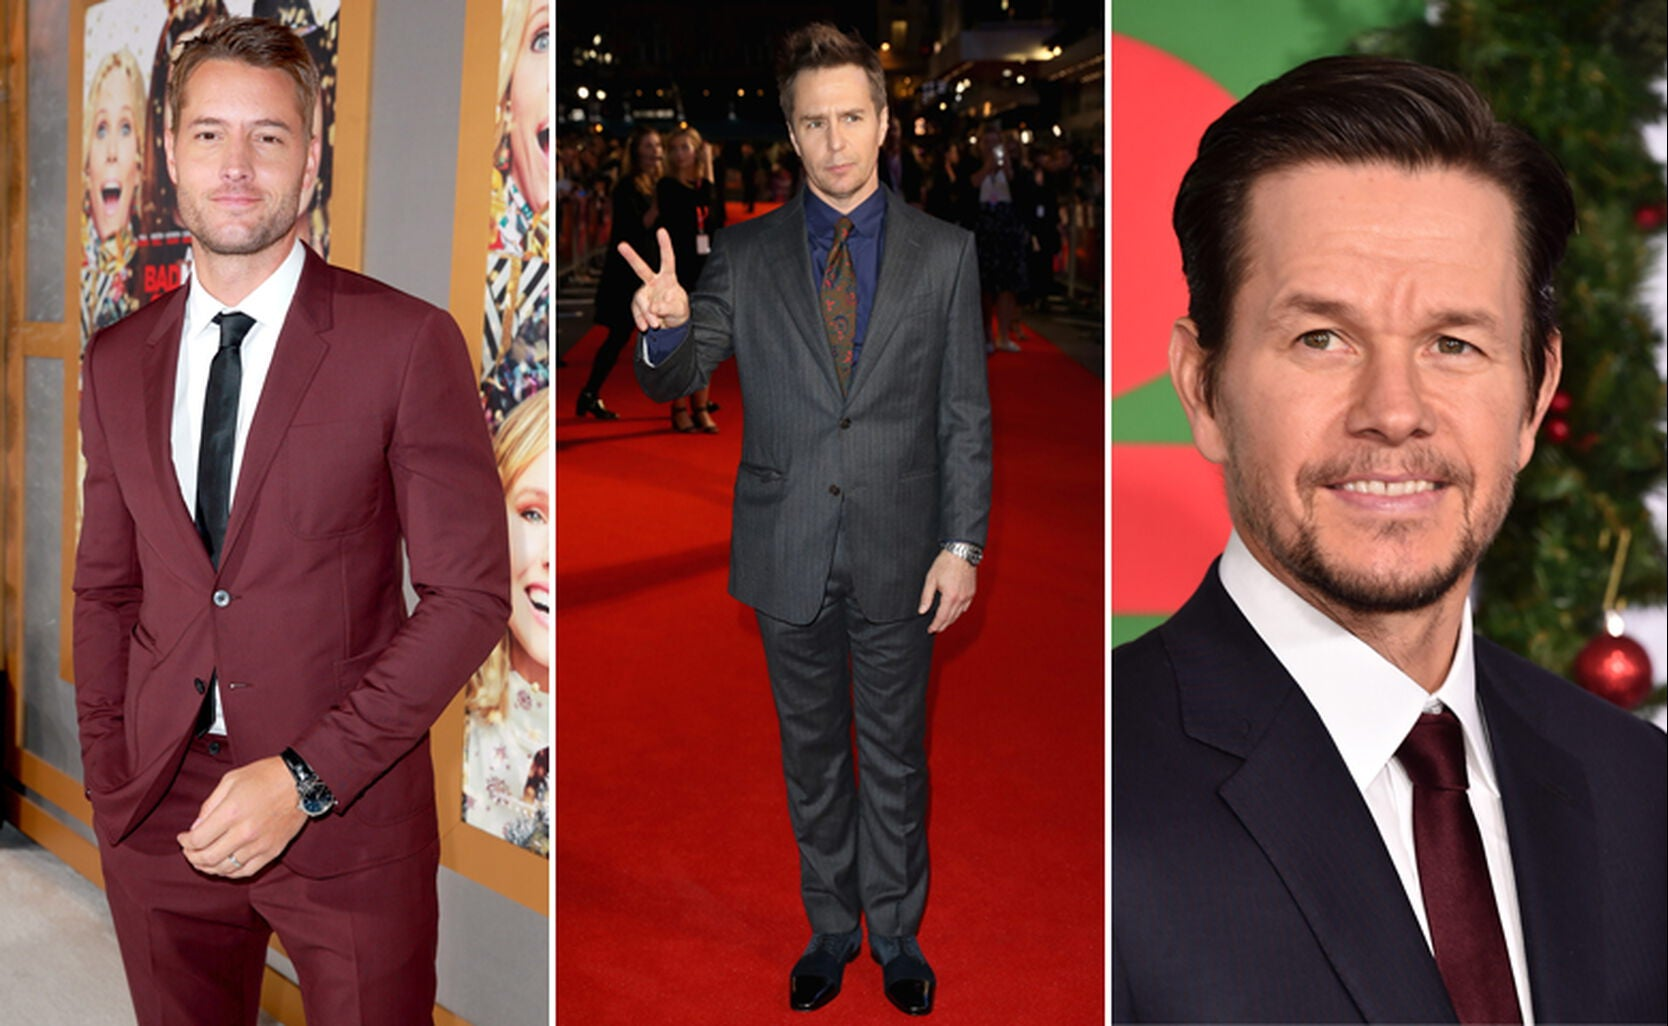 Justin Hartley, Sam Rockwell and Mark Wahlberg